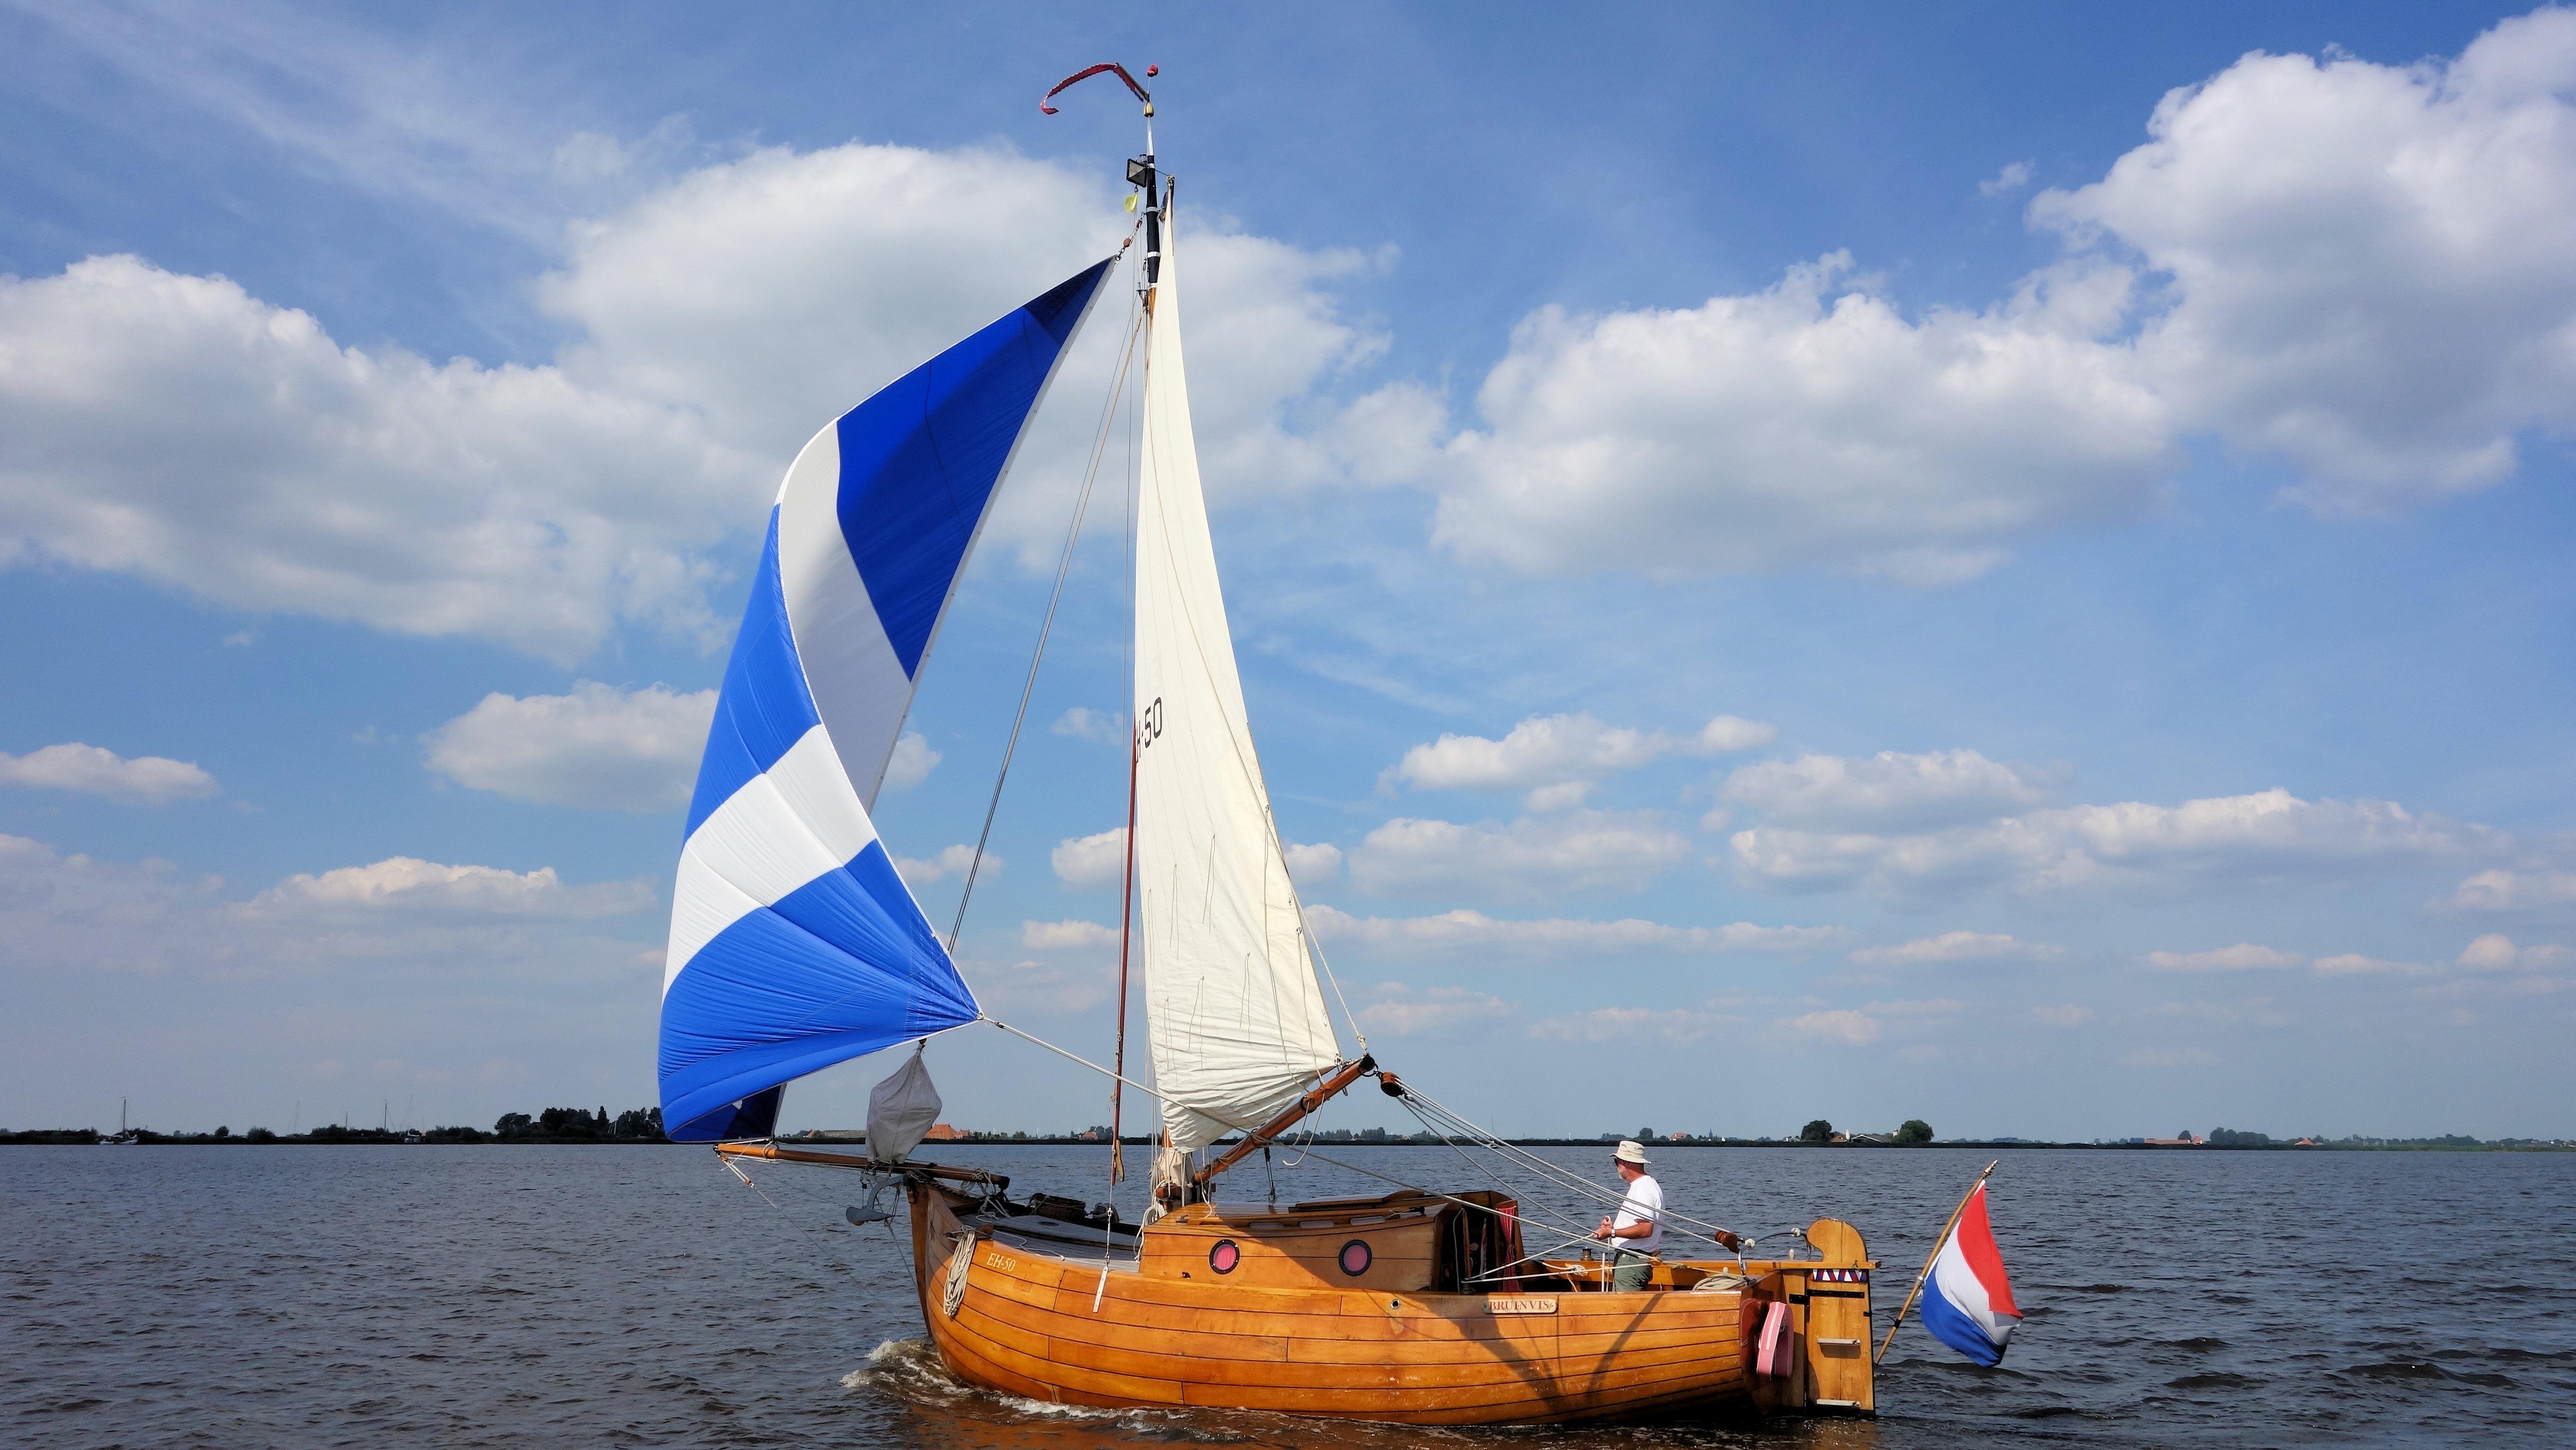 могли фото лодки с парусами можно избежать, если